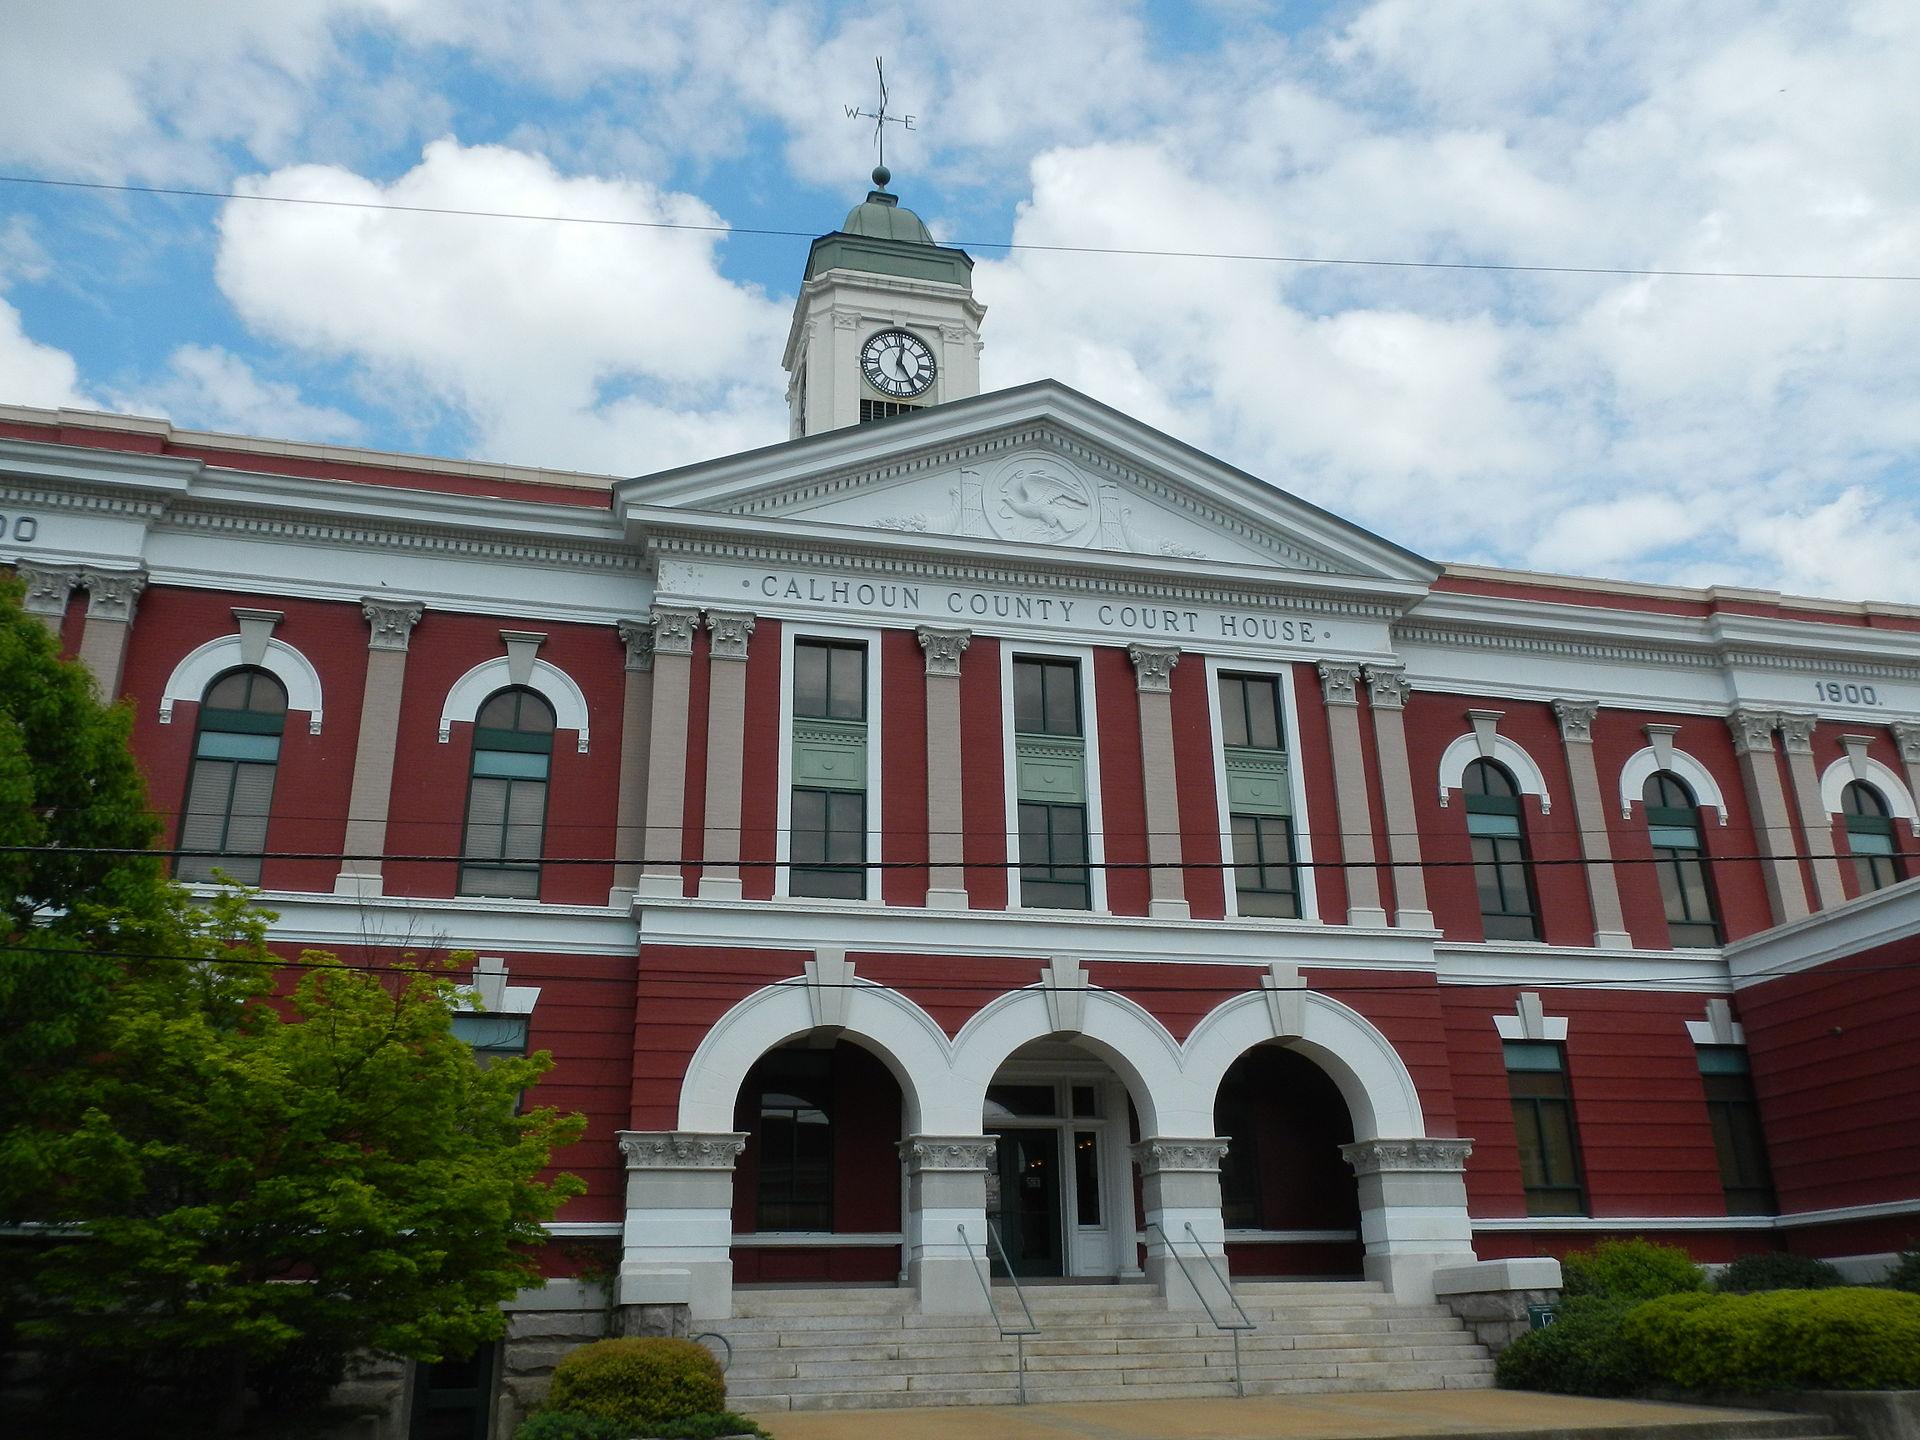 Lee County Alabama Property Tax Phone Number Robert Probate Judge